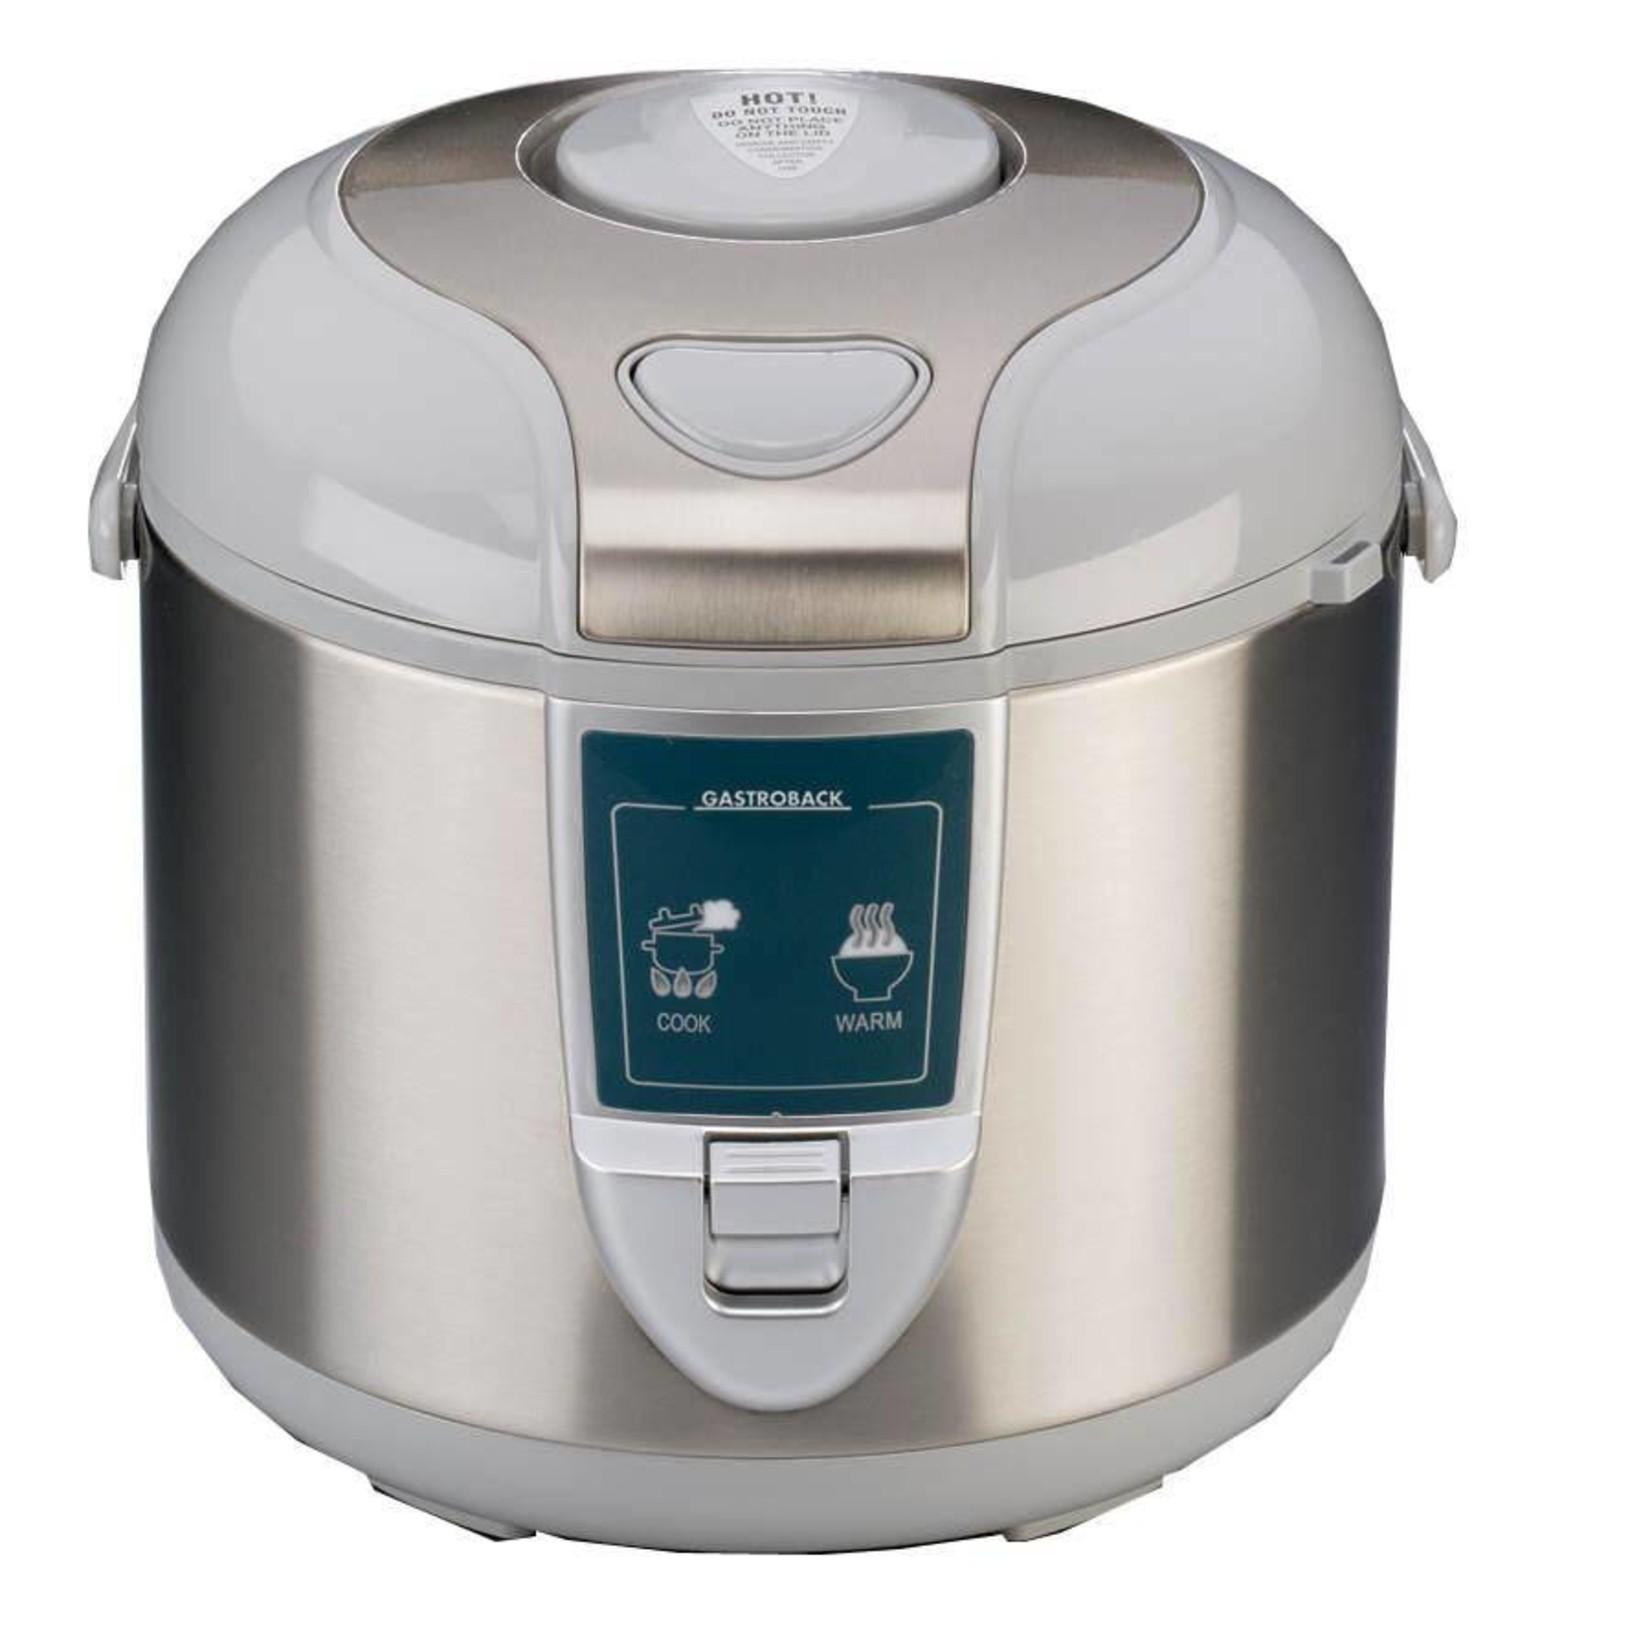 Gastroback Gastroback design rijstkoker